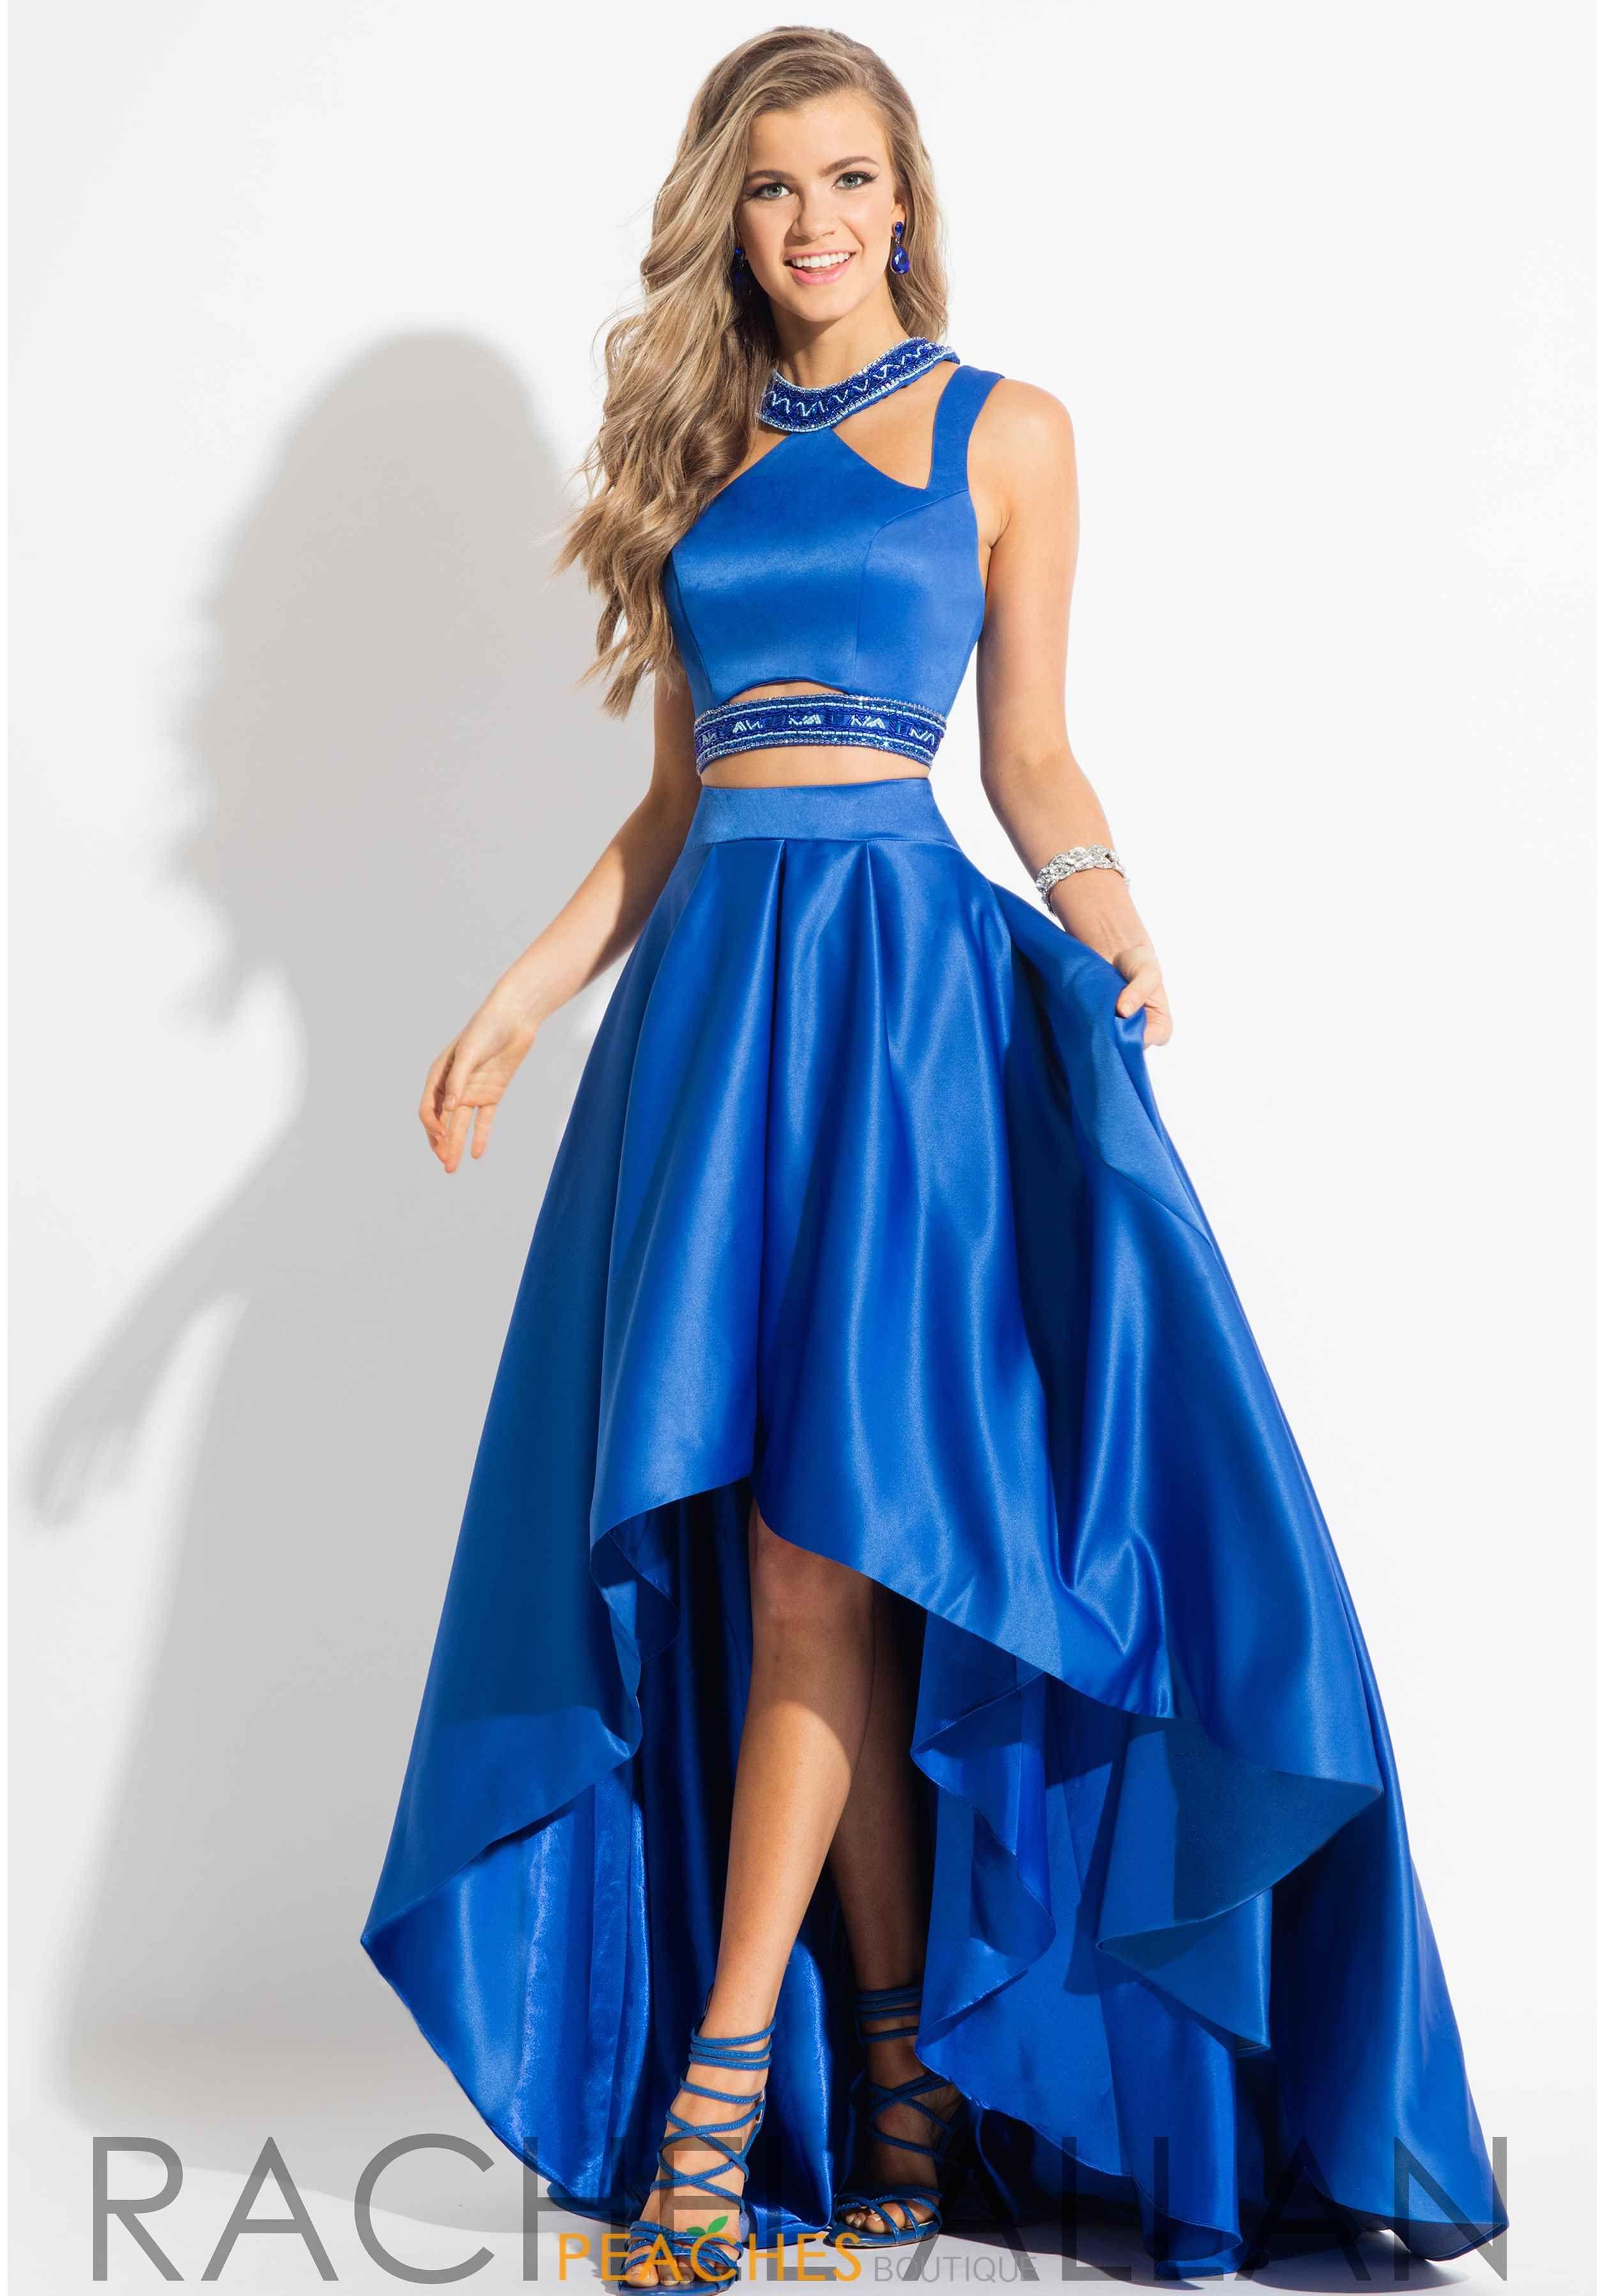 Rachel Allan Prom Dresses Peaches Boutique Piece Prom Dress Elegant Wedding Guest Dress Ball Dresses [ 3594 x 2500 Pixel ]